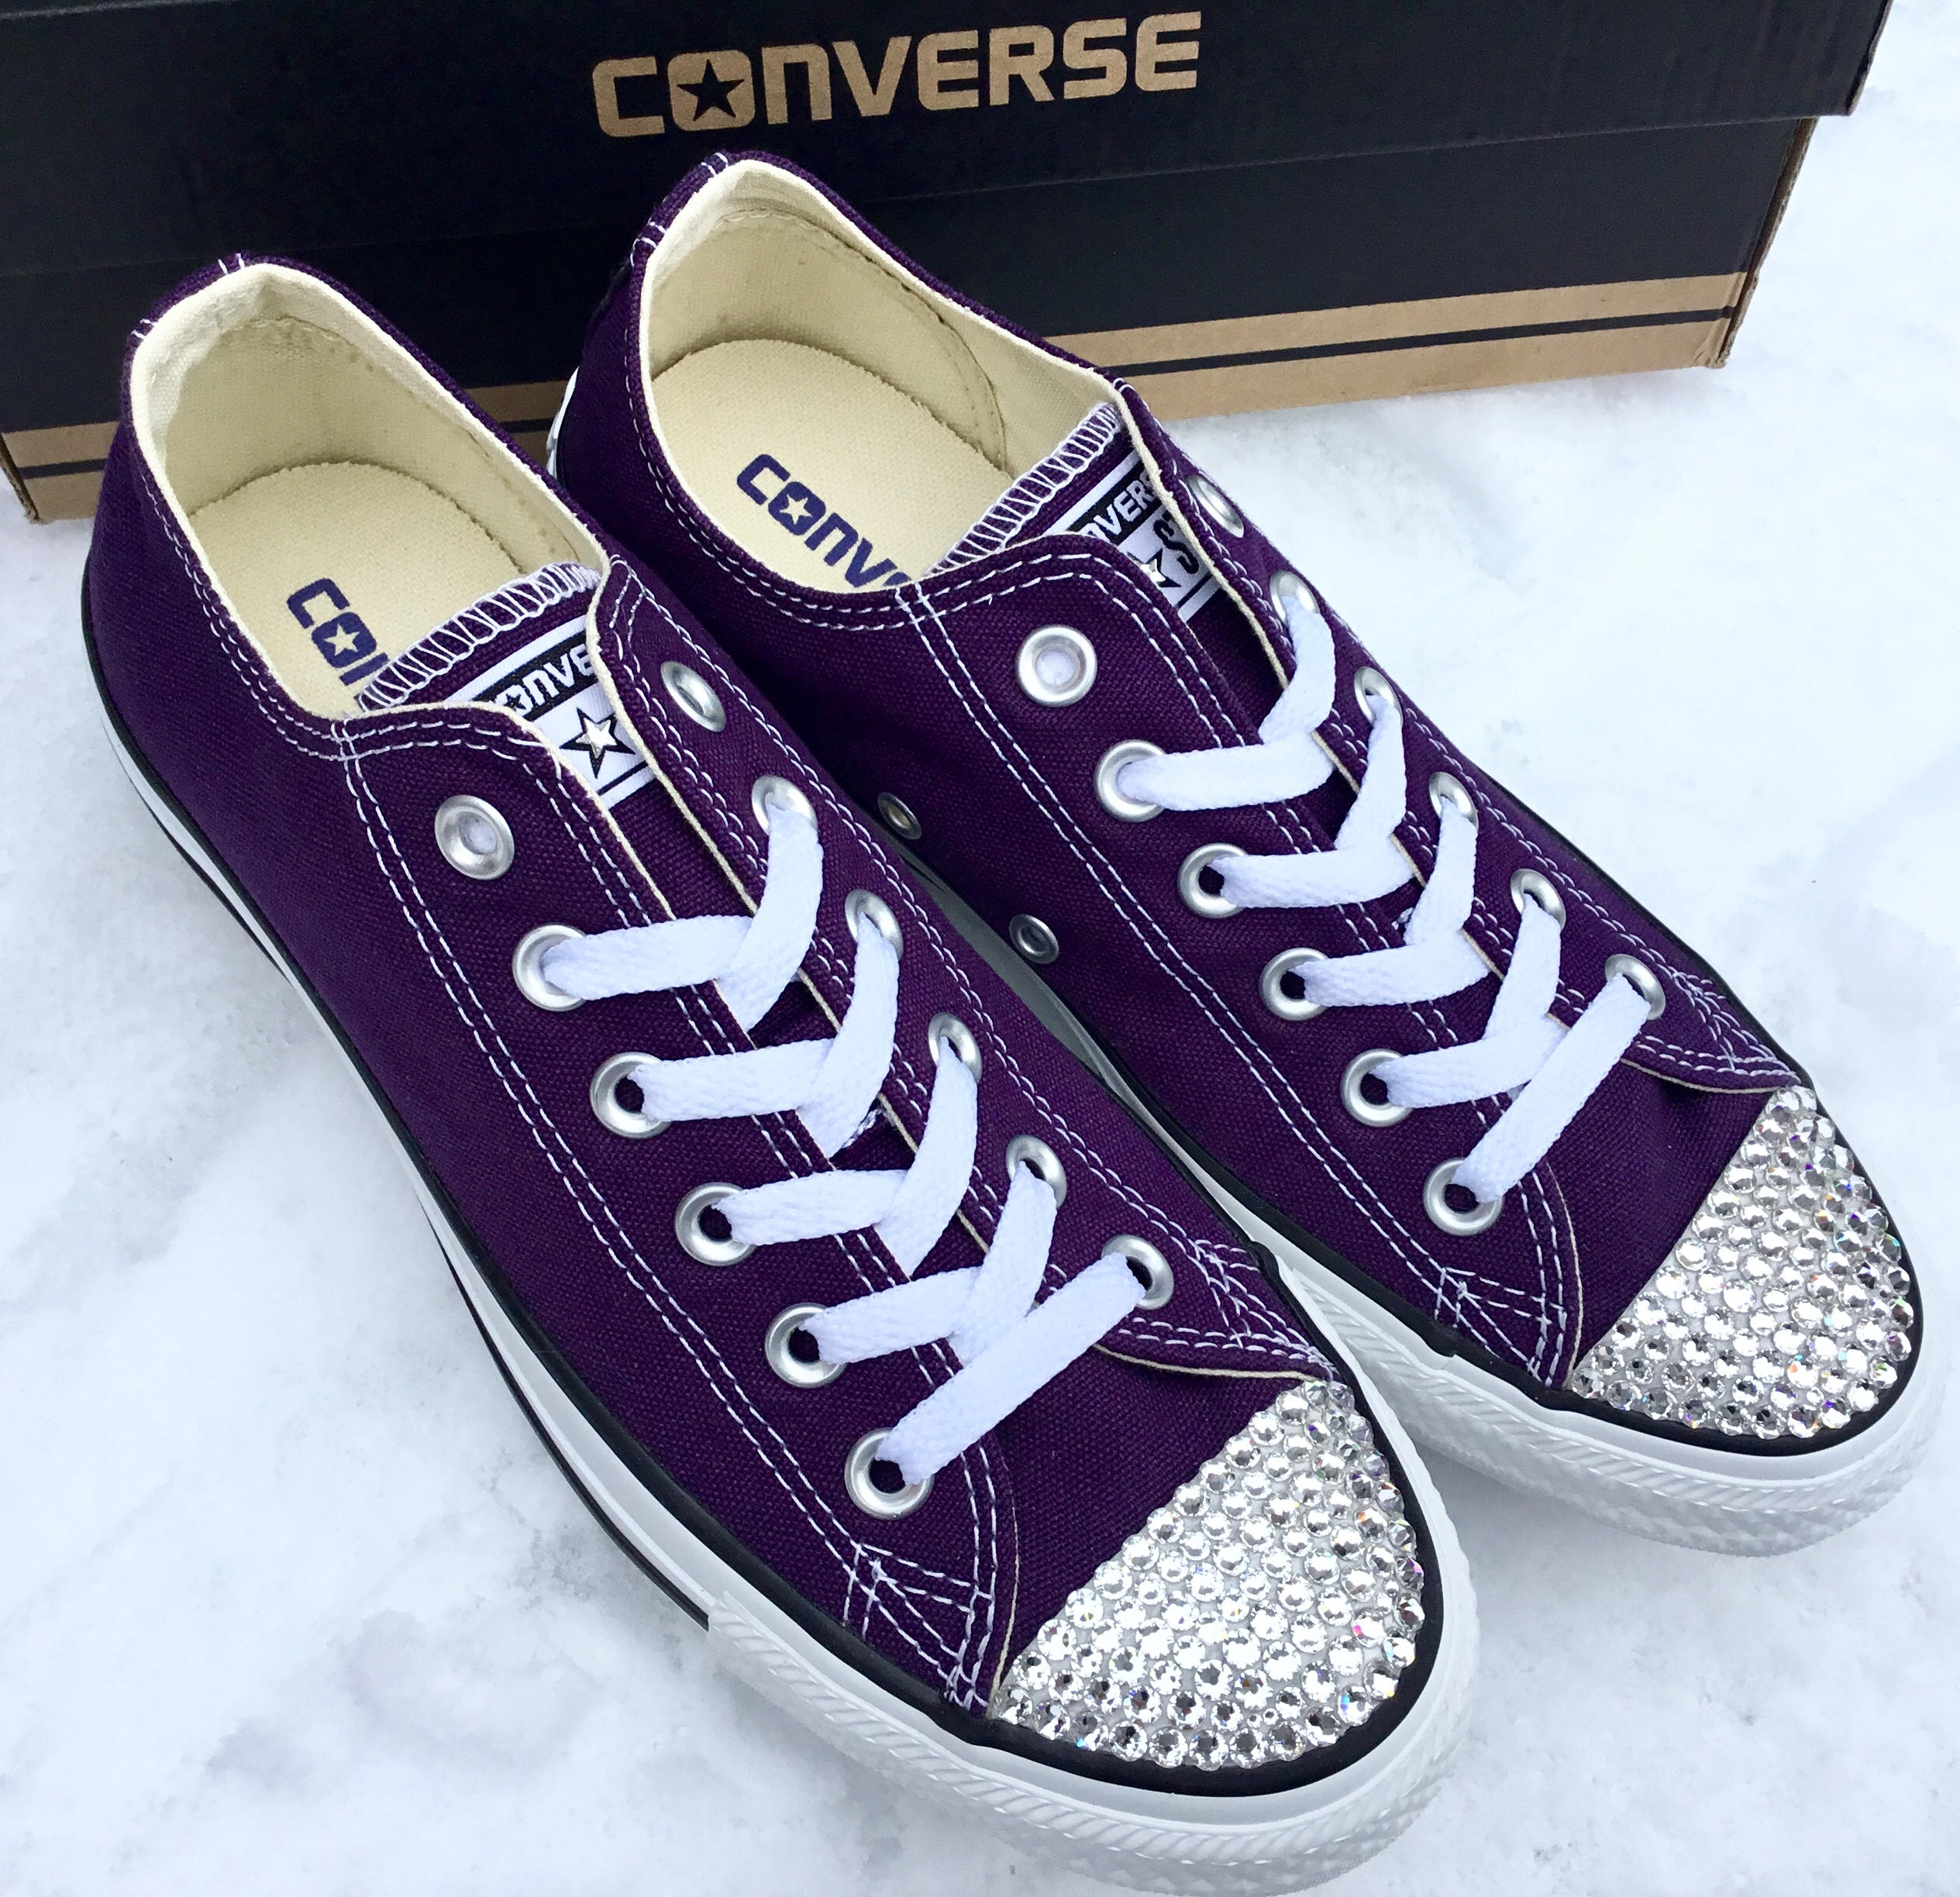 774a3795450 Purple Converse Low Top Eggplant Peel Custom Bling Bridal Wedding Kicks w  Swarovski  Crystal Rhinestone Chuck Taylor All Star Sneakers Shoes